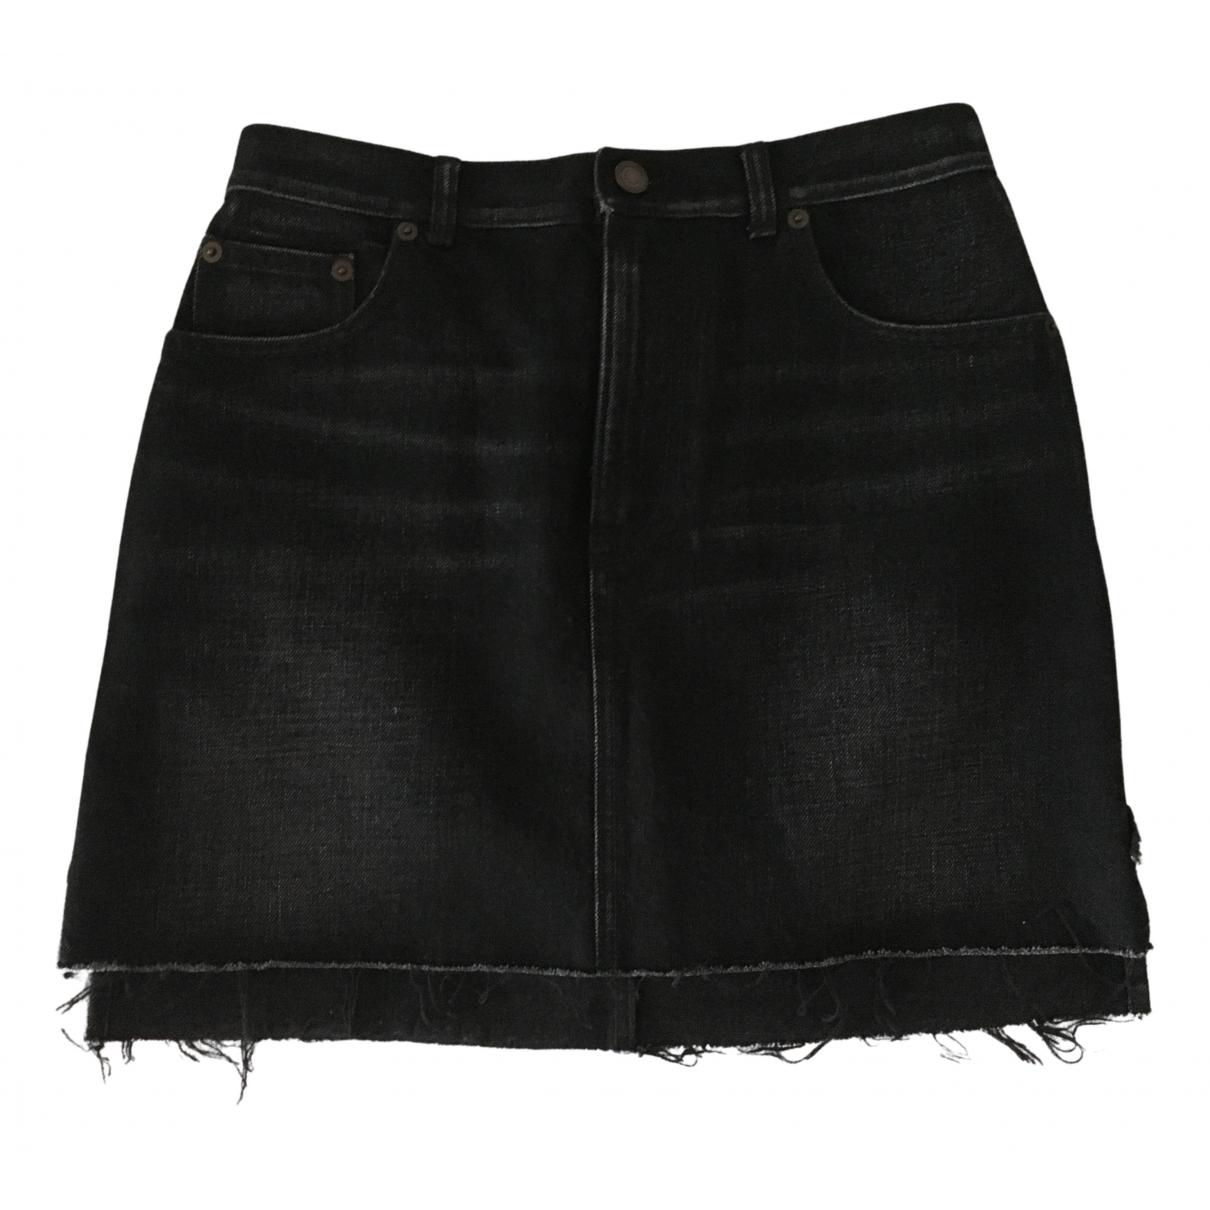 Saint Laurent N Black Cotton skirt for Women 36 IT